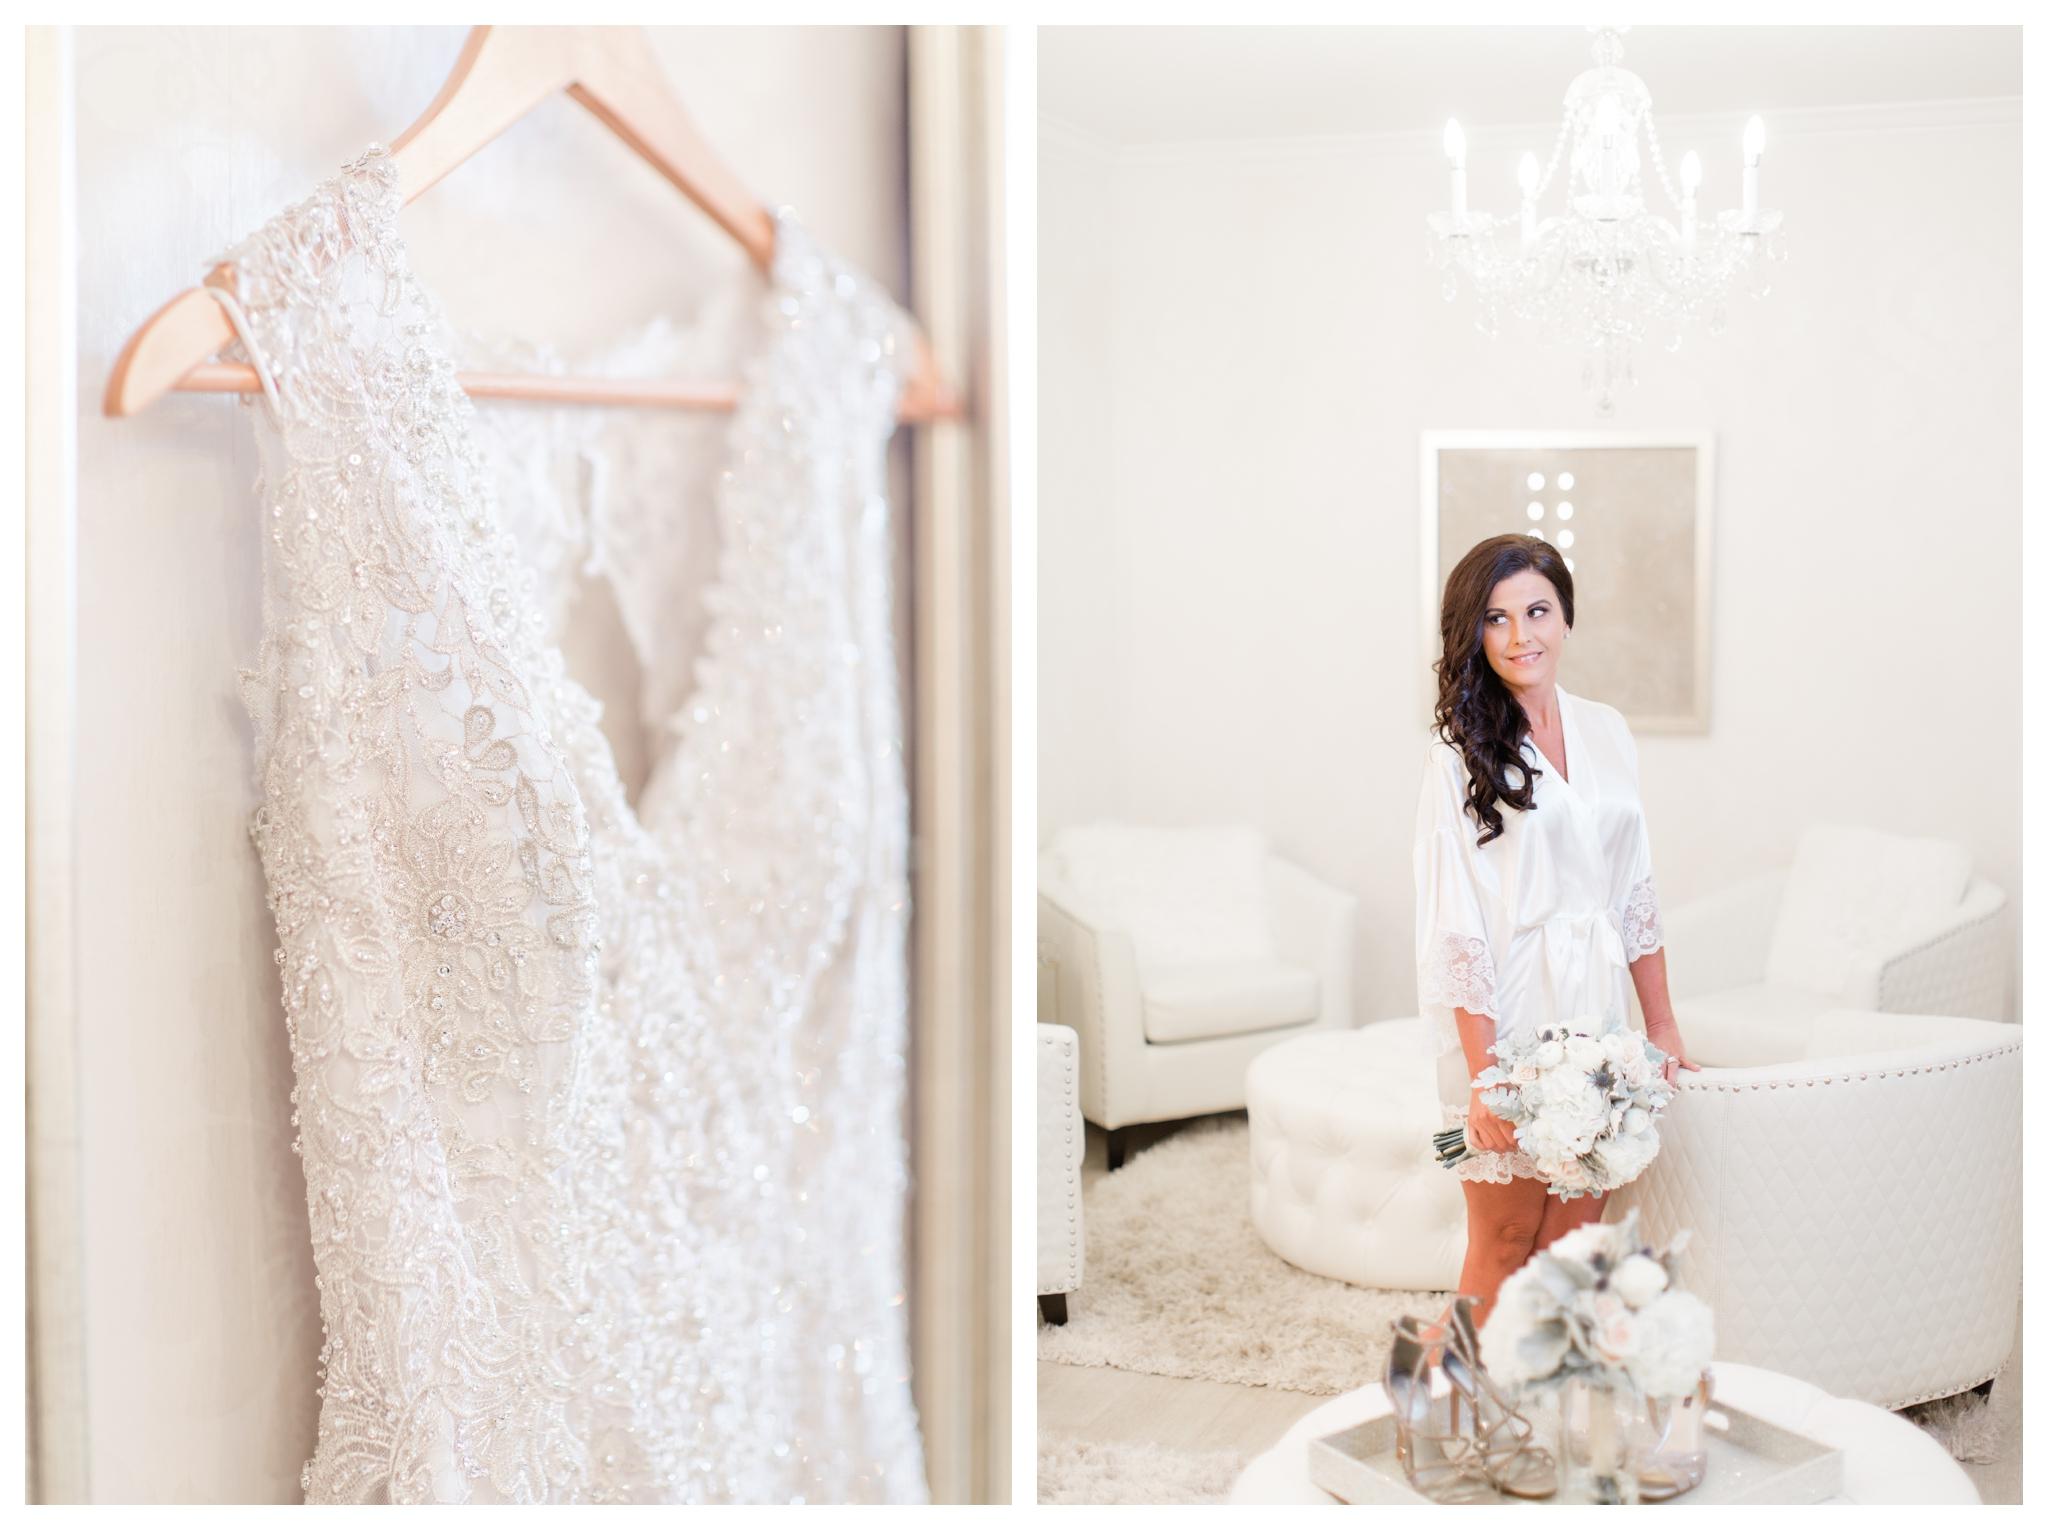 DRESS - The White Room   Lebanon, Tennessee